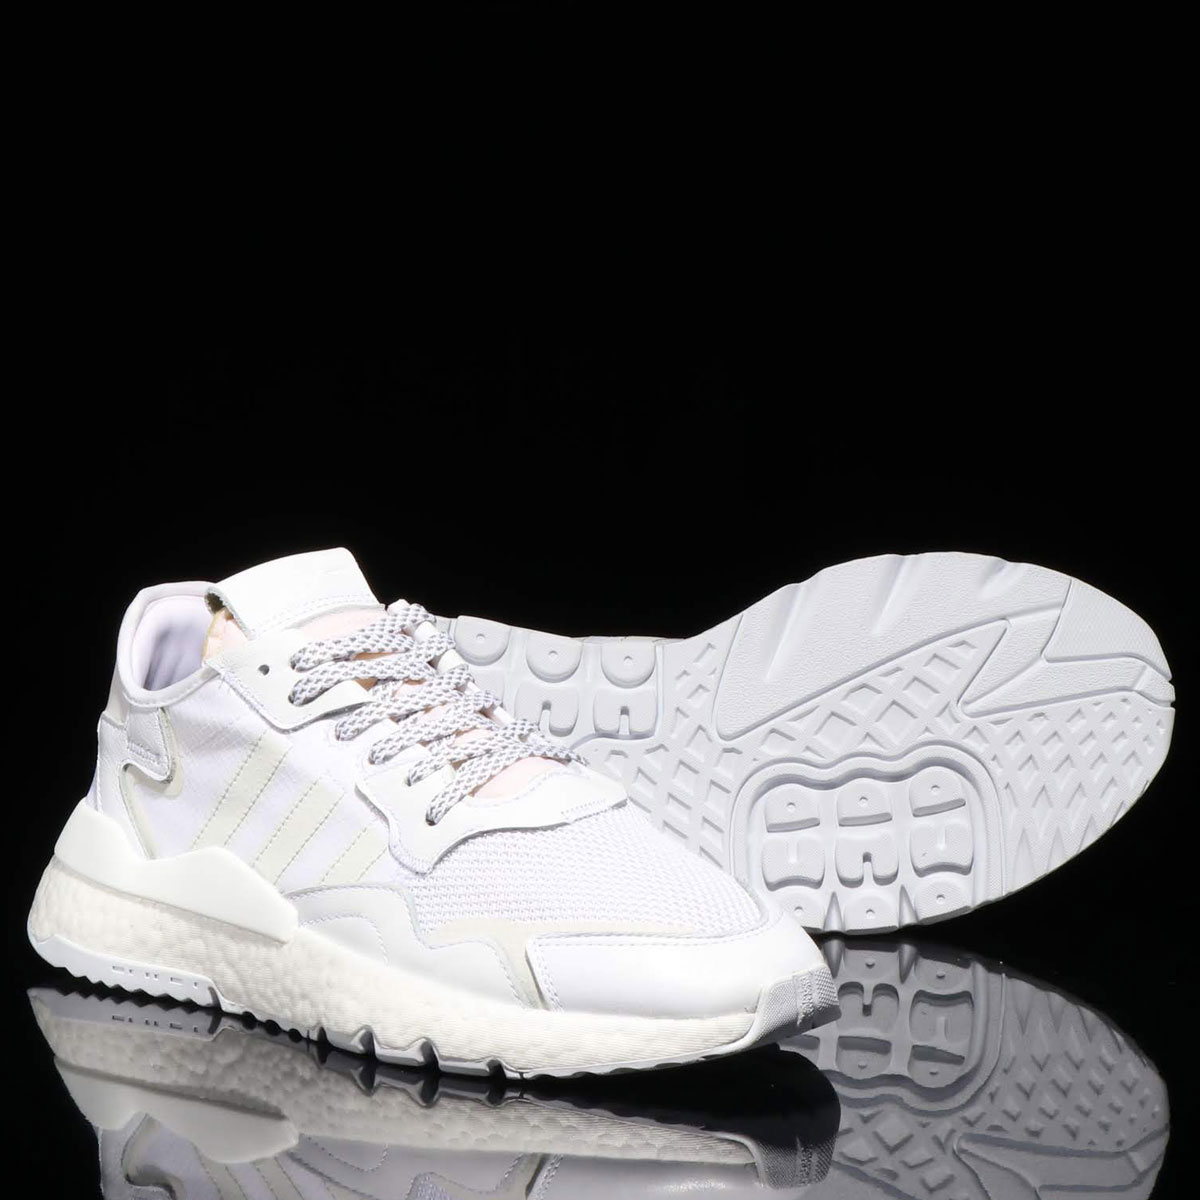 adidas Originals NITE JOGGER (アディダスオリジナルス ナイト ジョガー)FTWR WHITE/CRYSTAL WHITE/CRYSTAL WHITE【メンズ レディース スニーカー】19SS-I